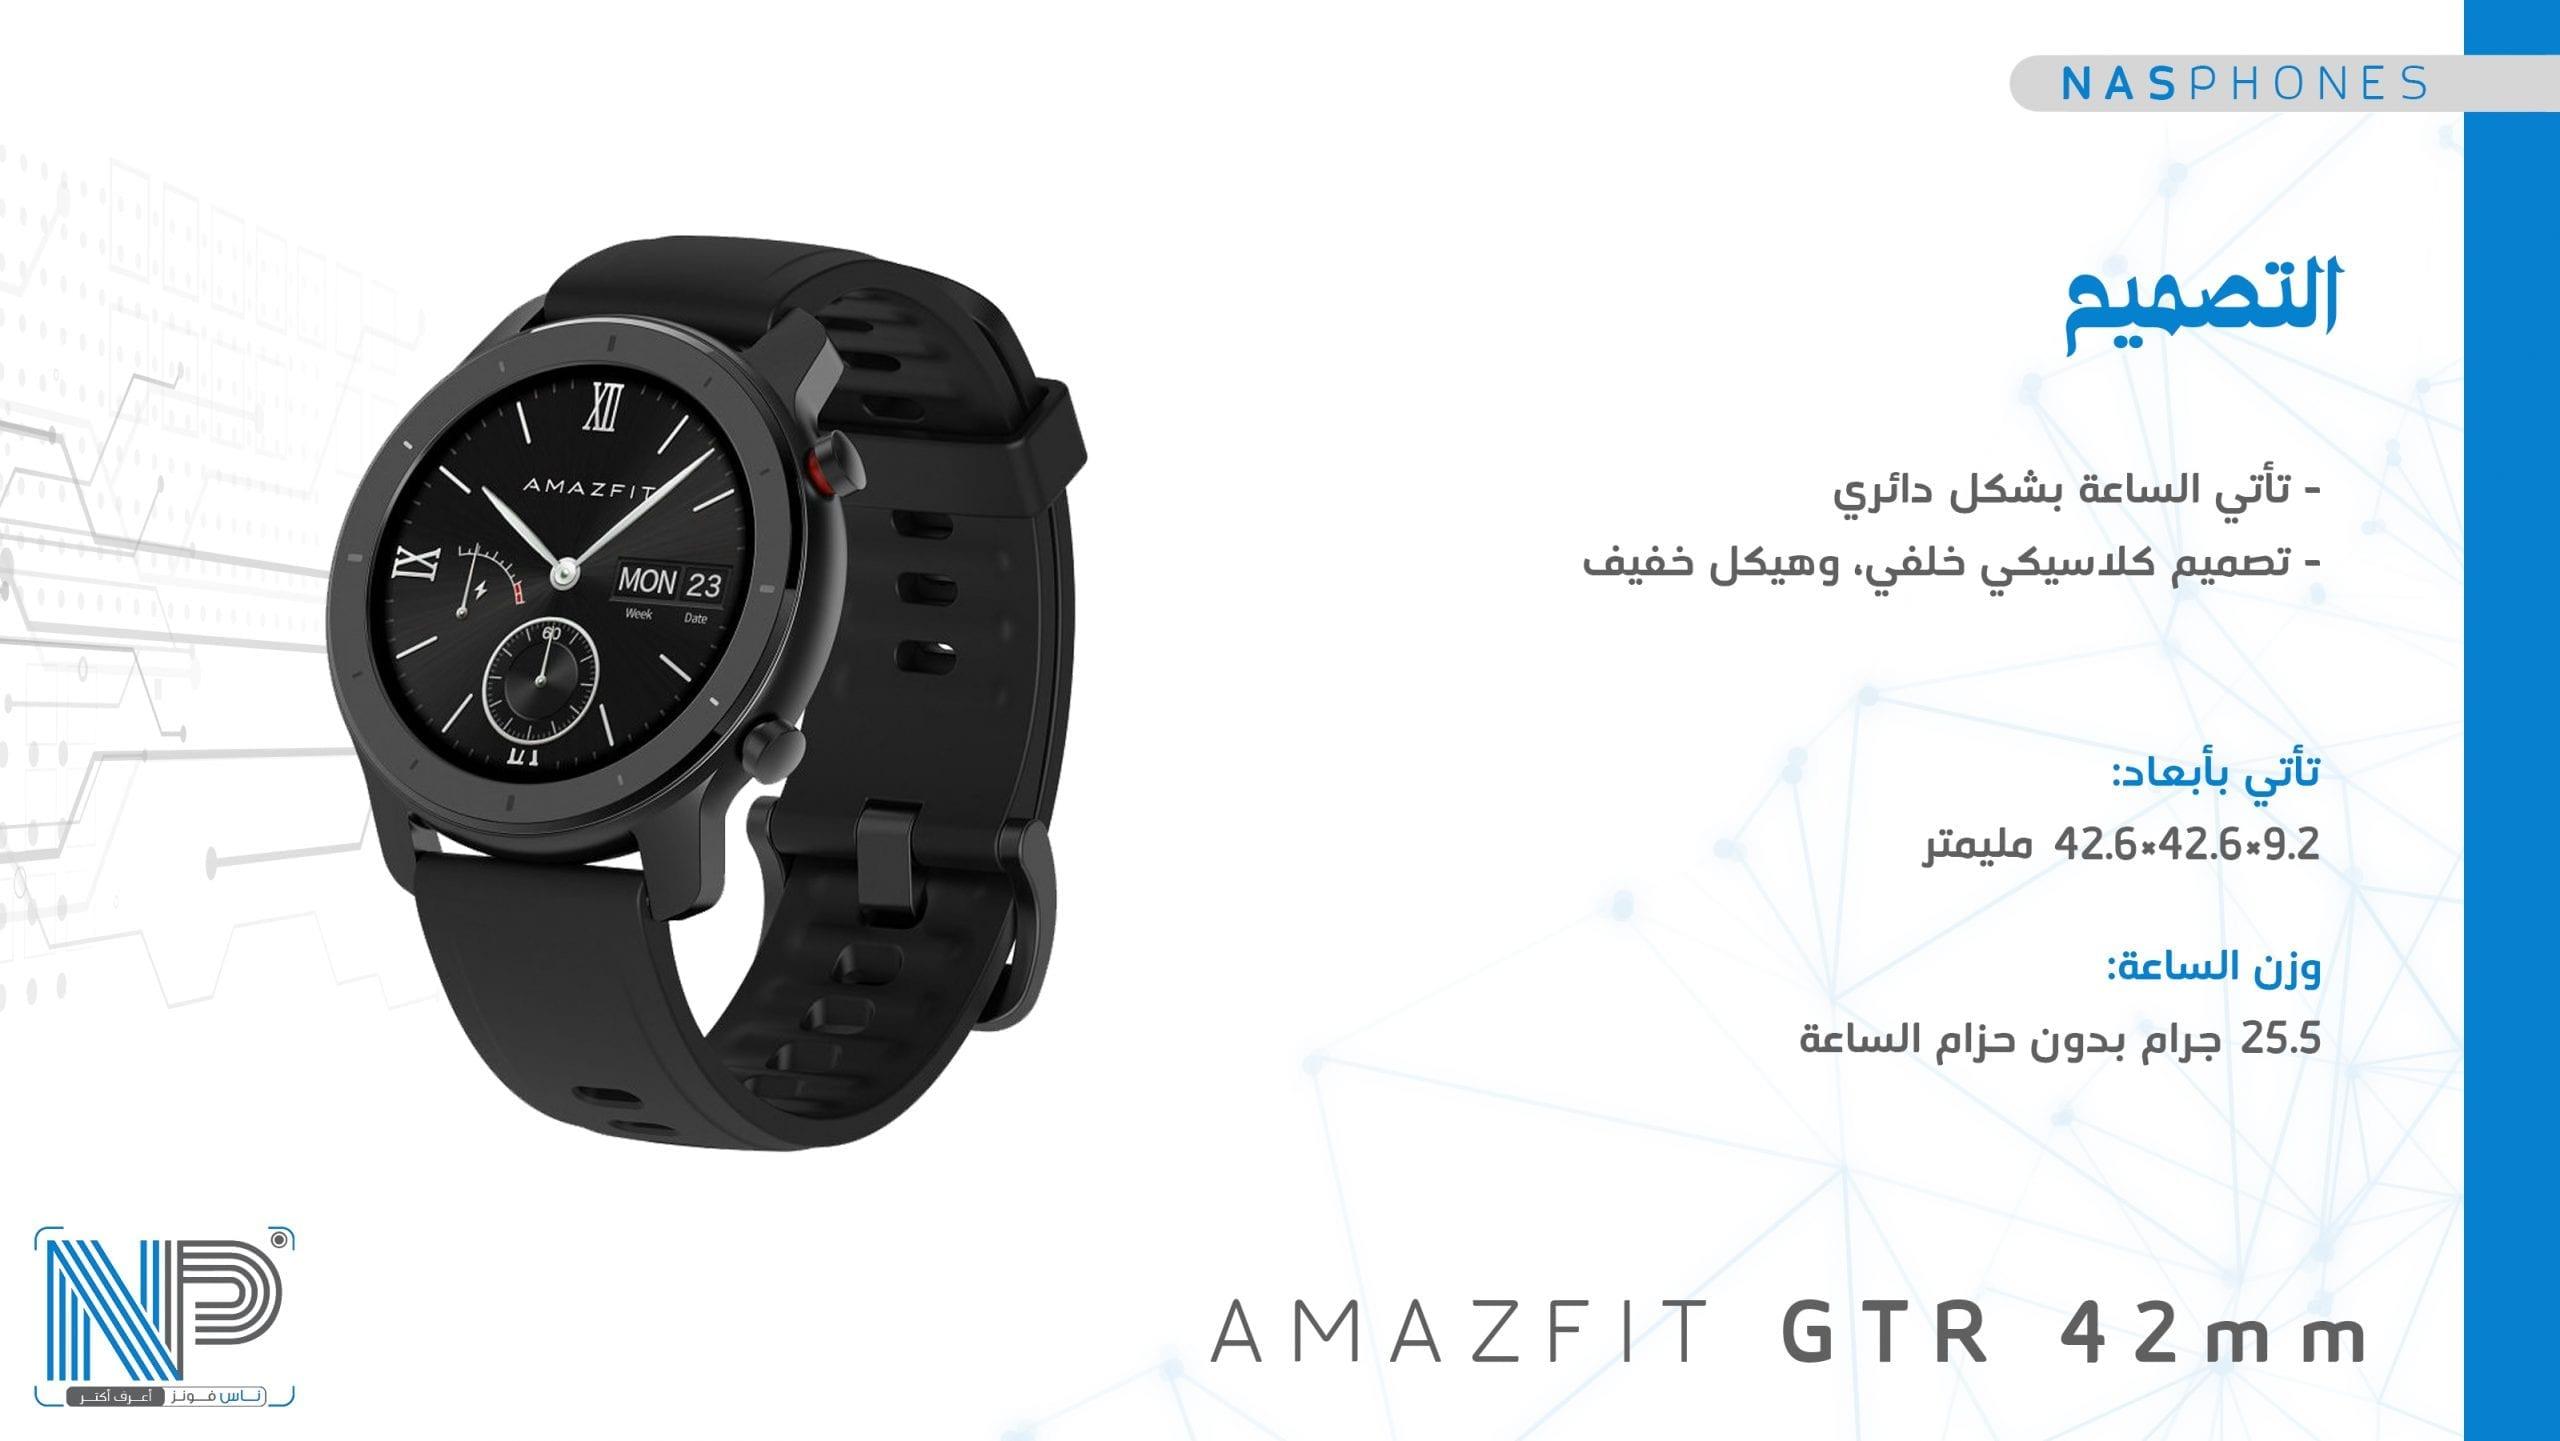 تصميم Amazfit GTR 42mm